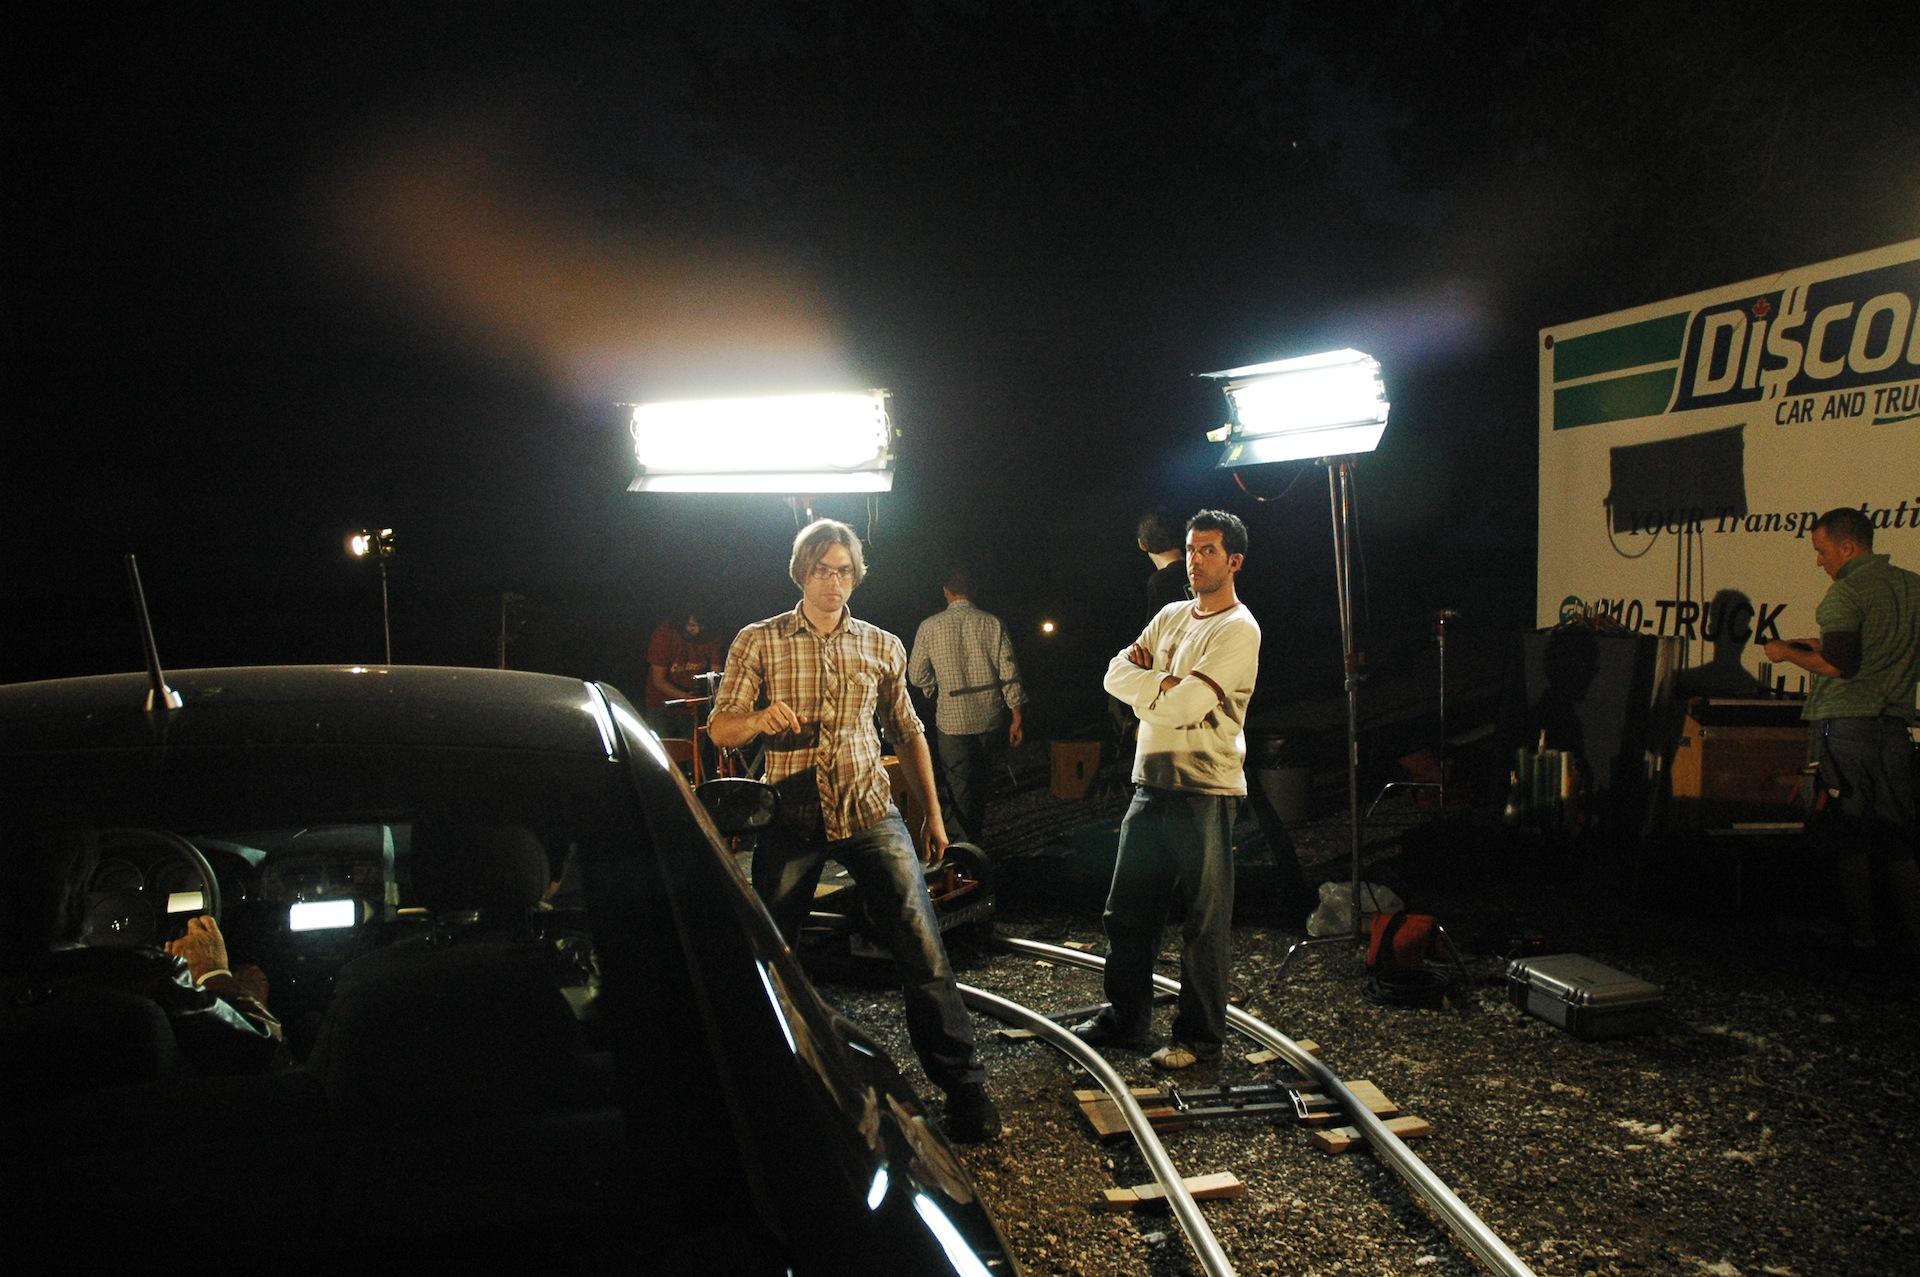 Director, Ken Simpson & Cinematographer, Alex Dacev